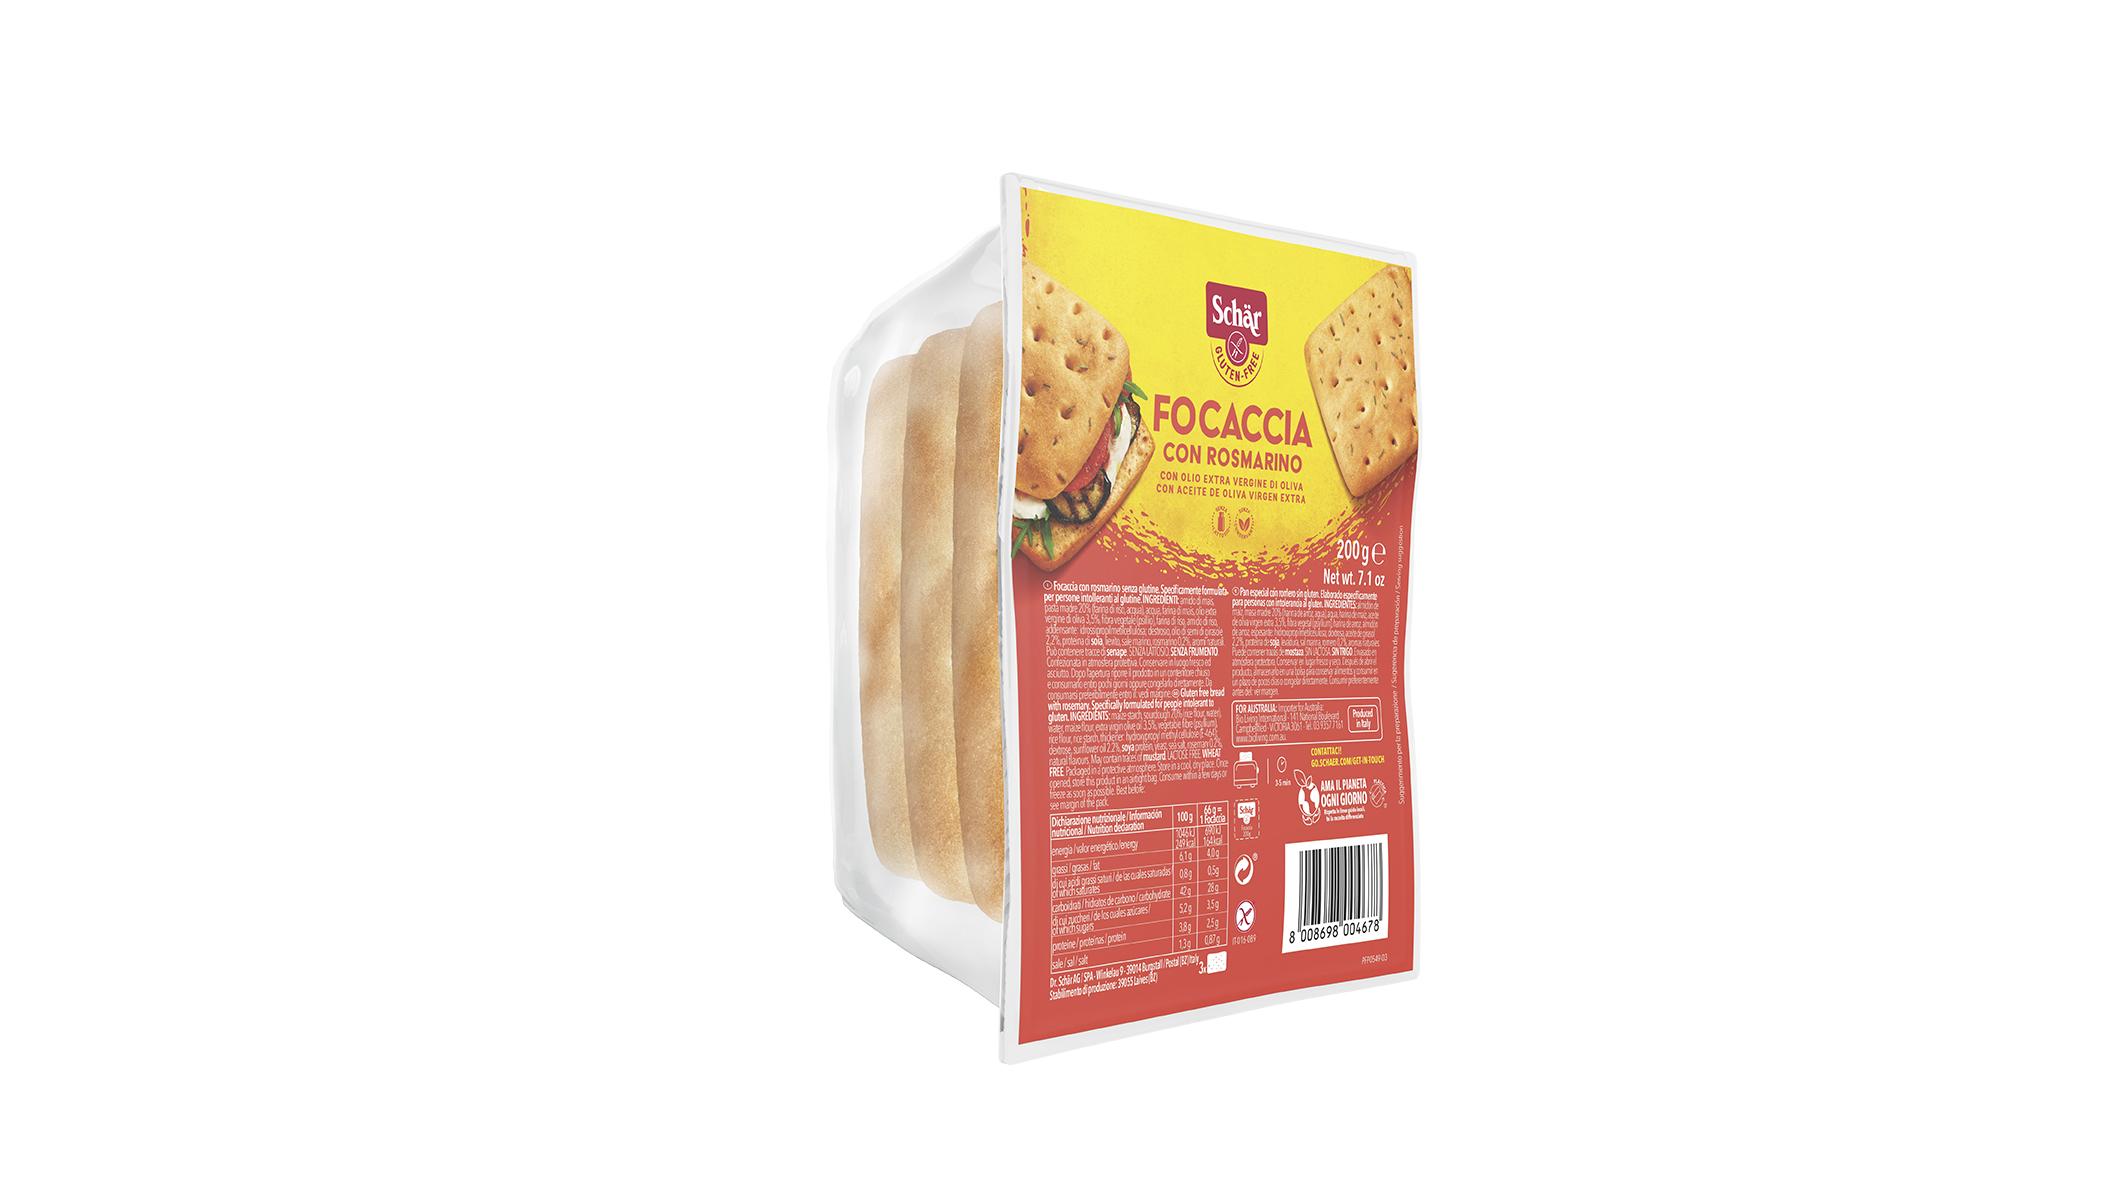 Brezglutenska fokača z rožmarinom – Focaccia con rosmarino